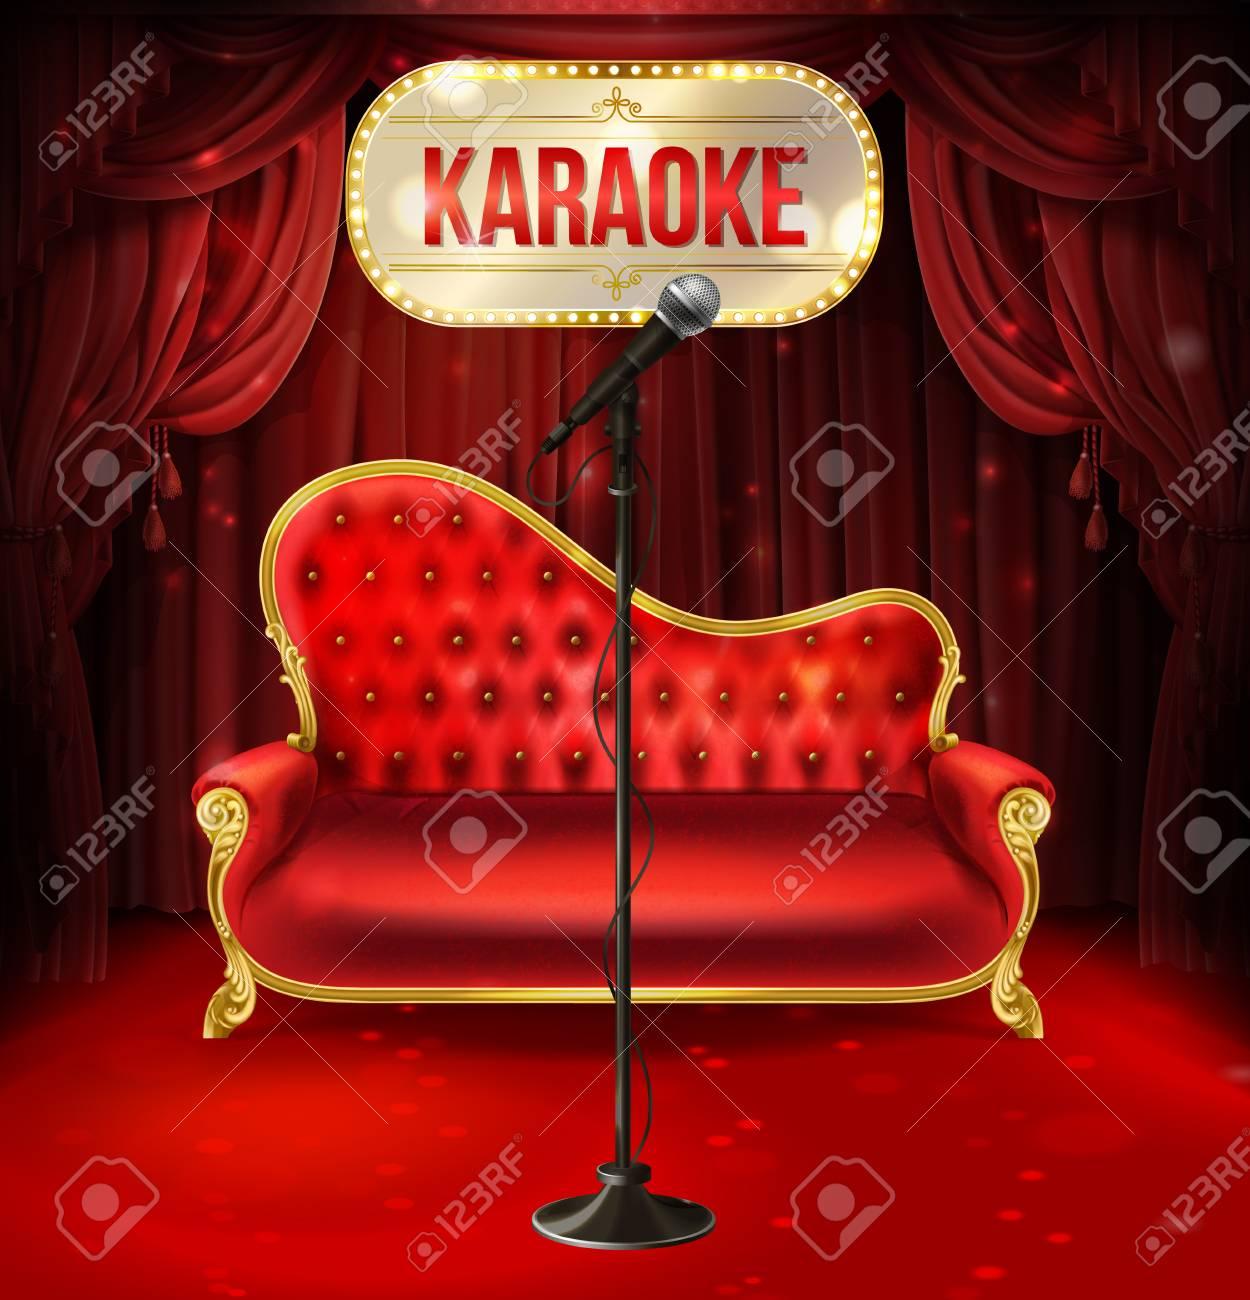 Vector Karaoke Concept. Red Velvet Sofa With Gilded Legs And.. Stock ...